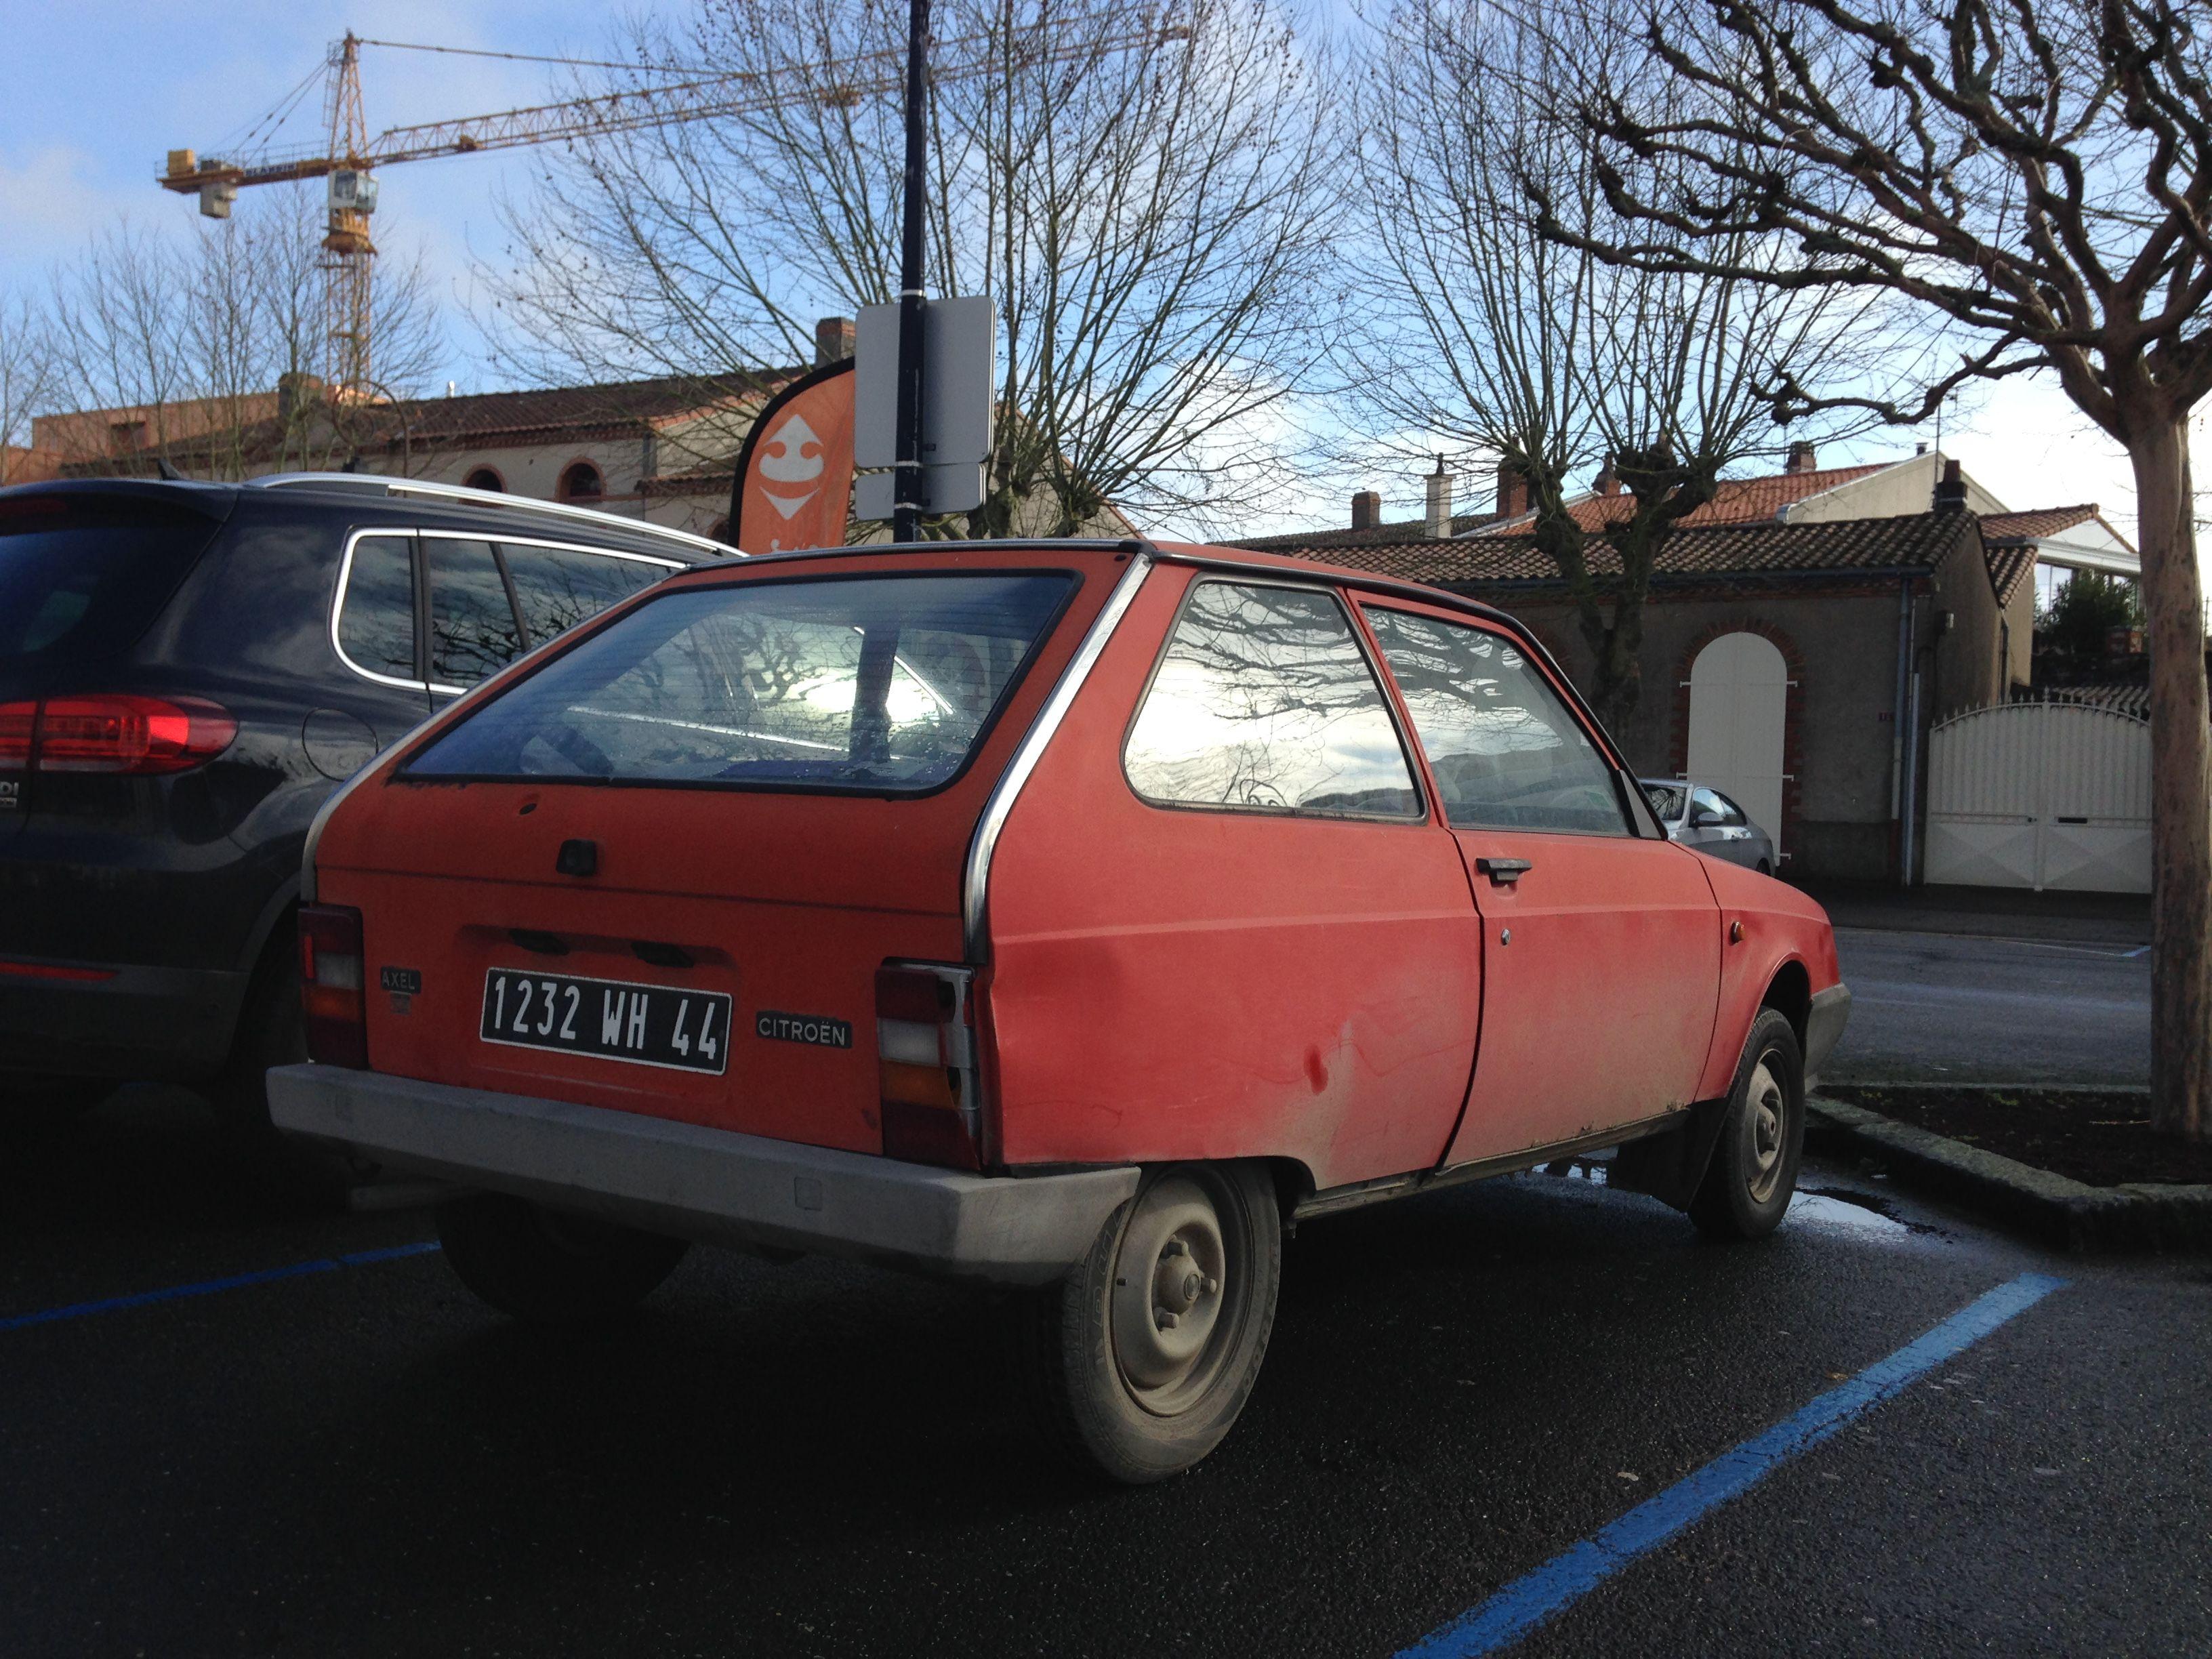 Citro n Axel rouge années 80 plus rare qu une Ferrari